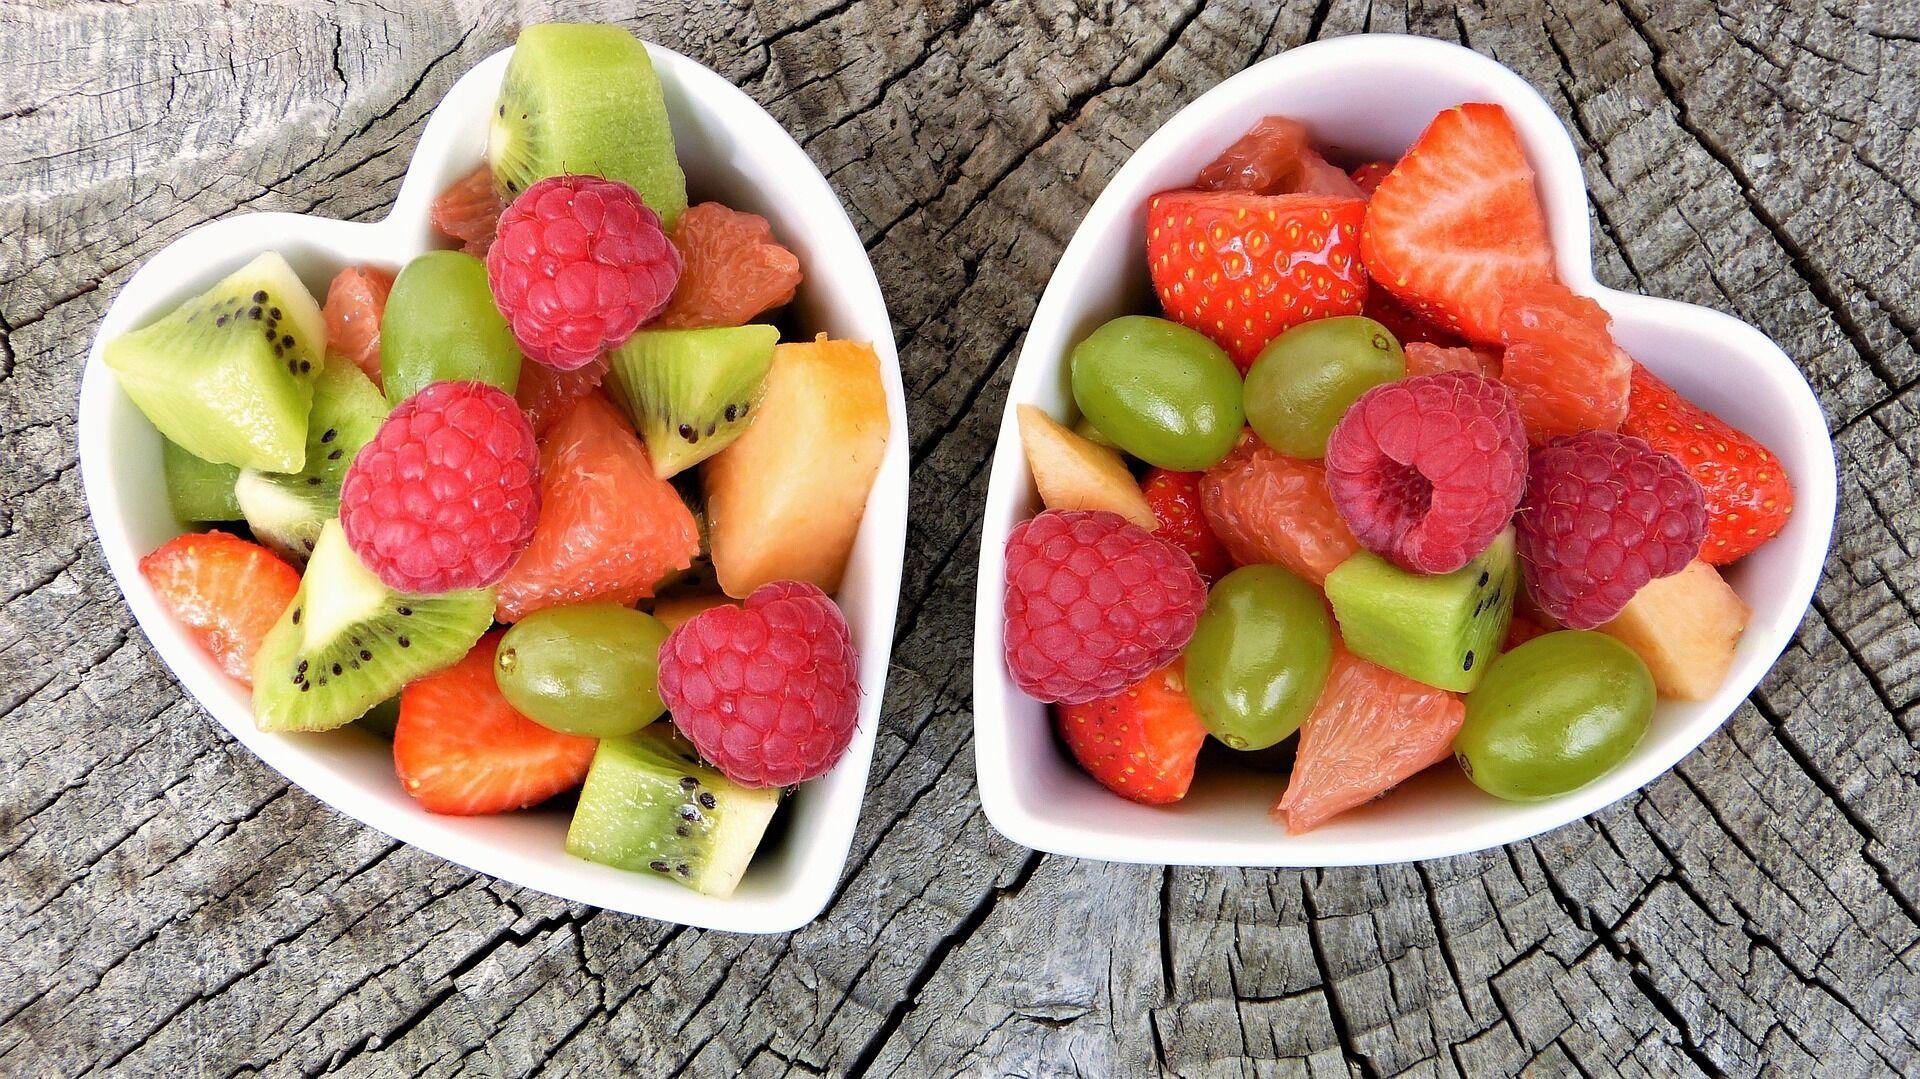 Eliminační dieta